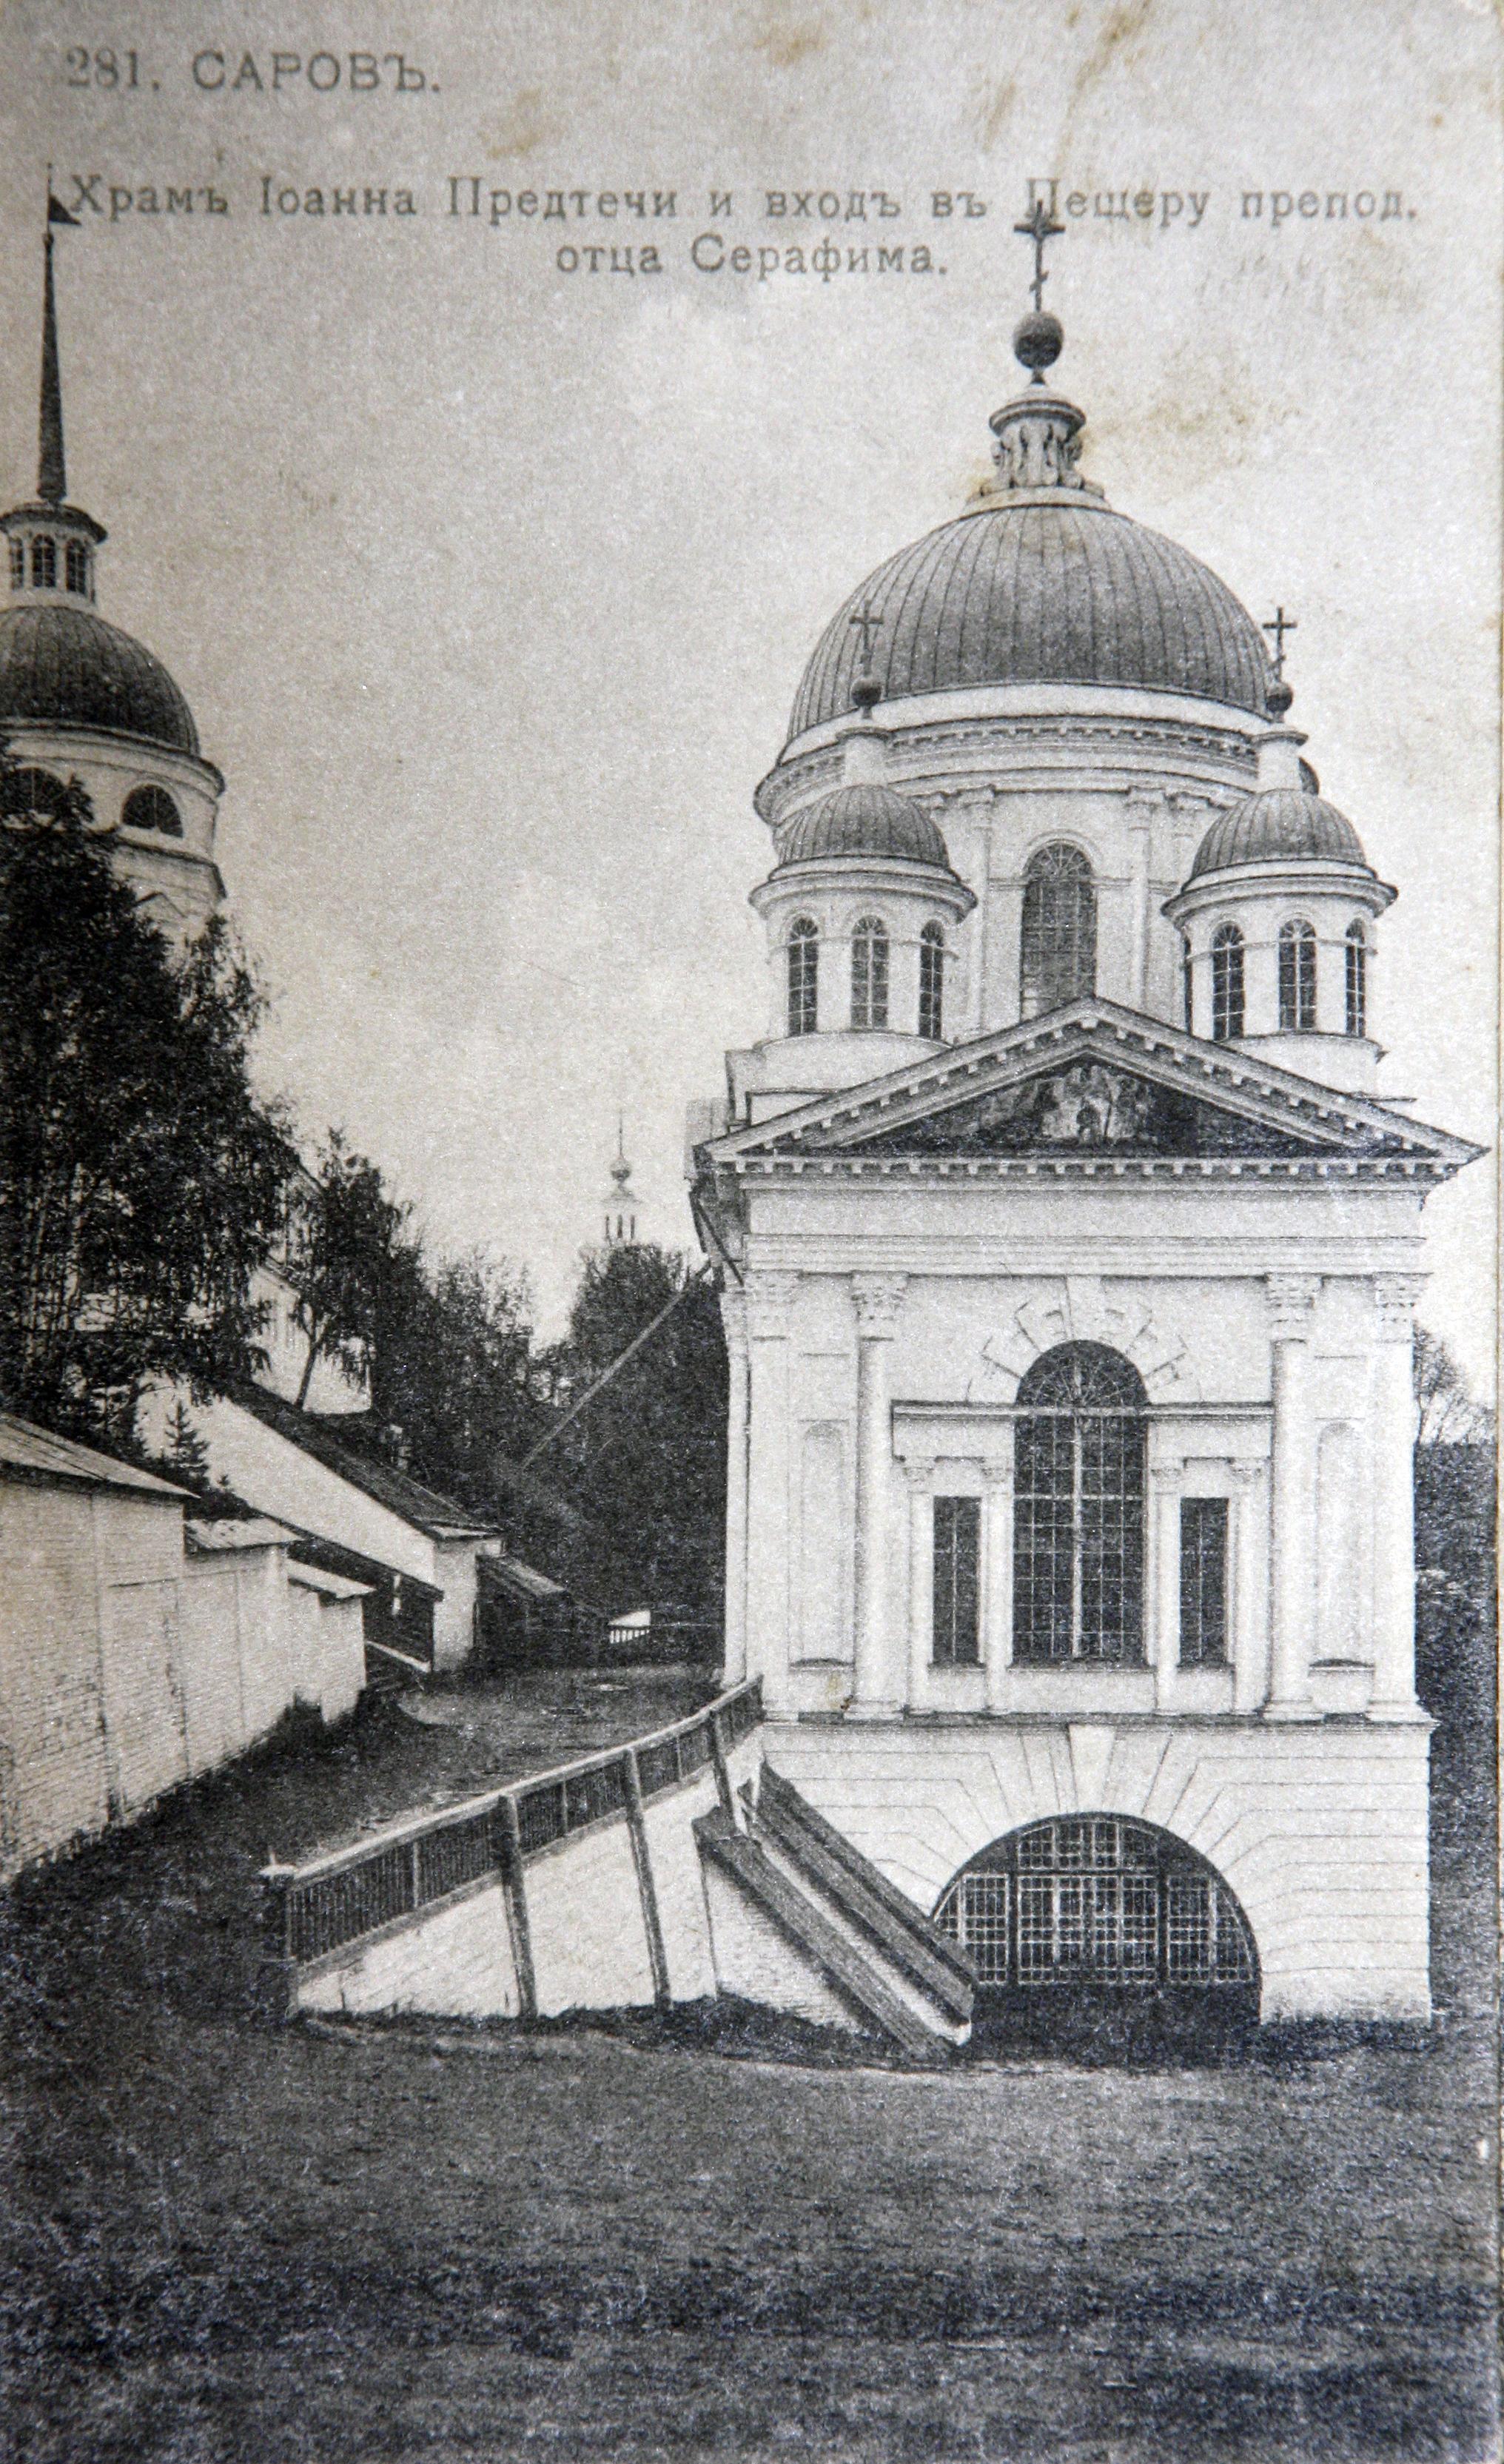 Храм Иоанн Предтечи и вход в Пещеру преподобного отца Серафима